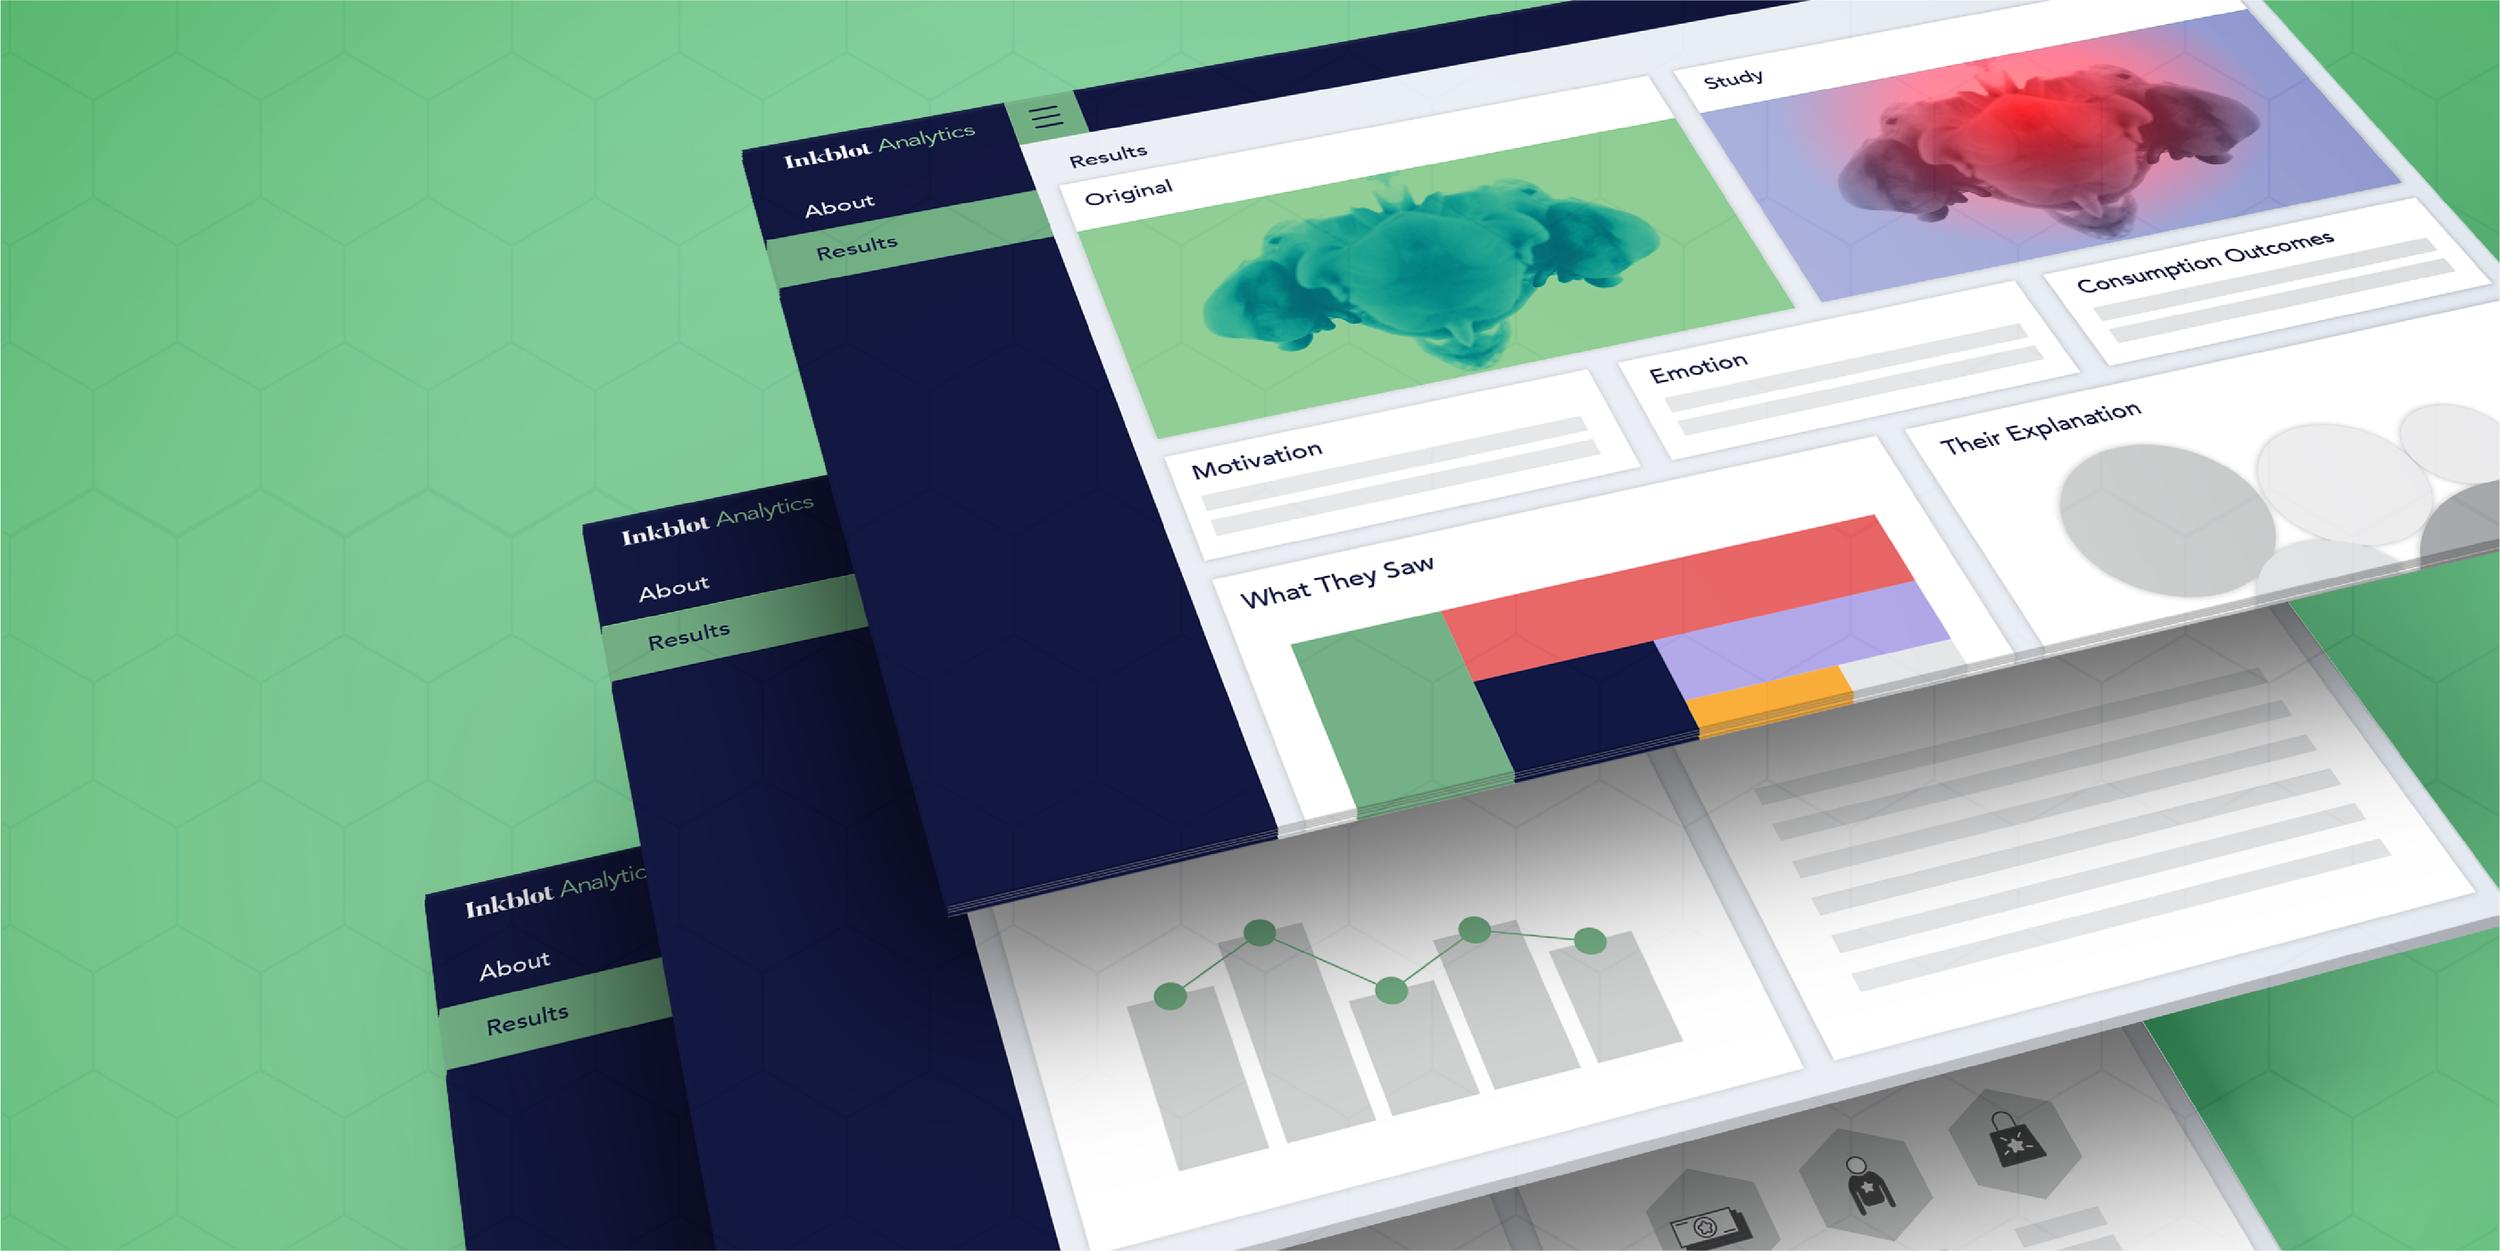 Inkblot Analytics marketing data visualization